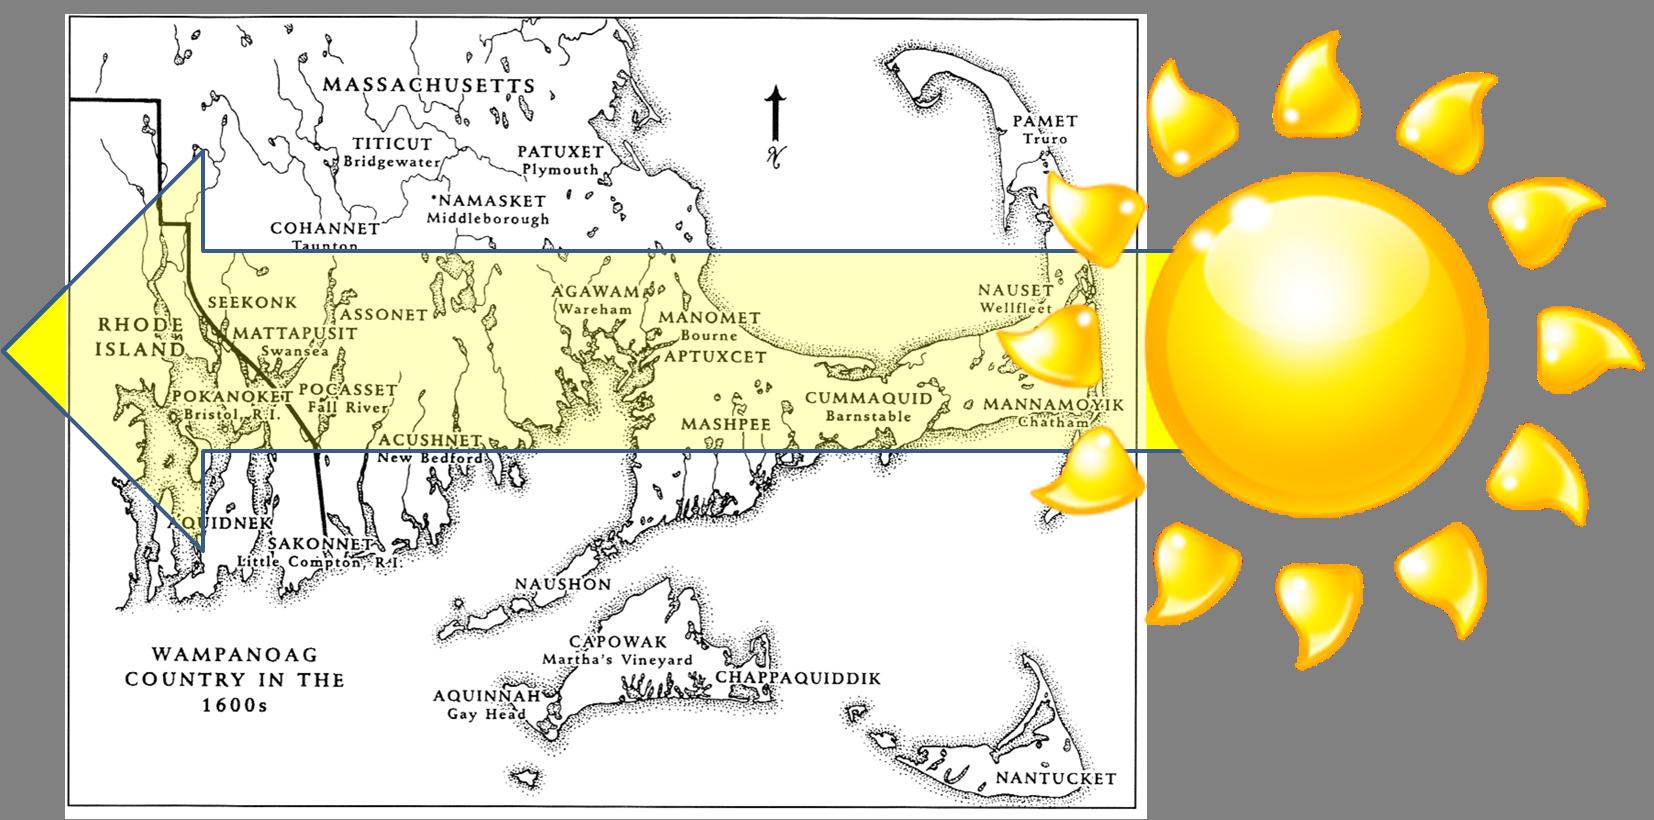 Wampanoag names are shown inALL CAPS.  (Source: Plimoth Plantation/www.plimoth.org)